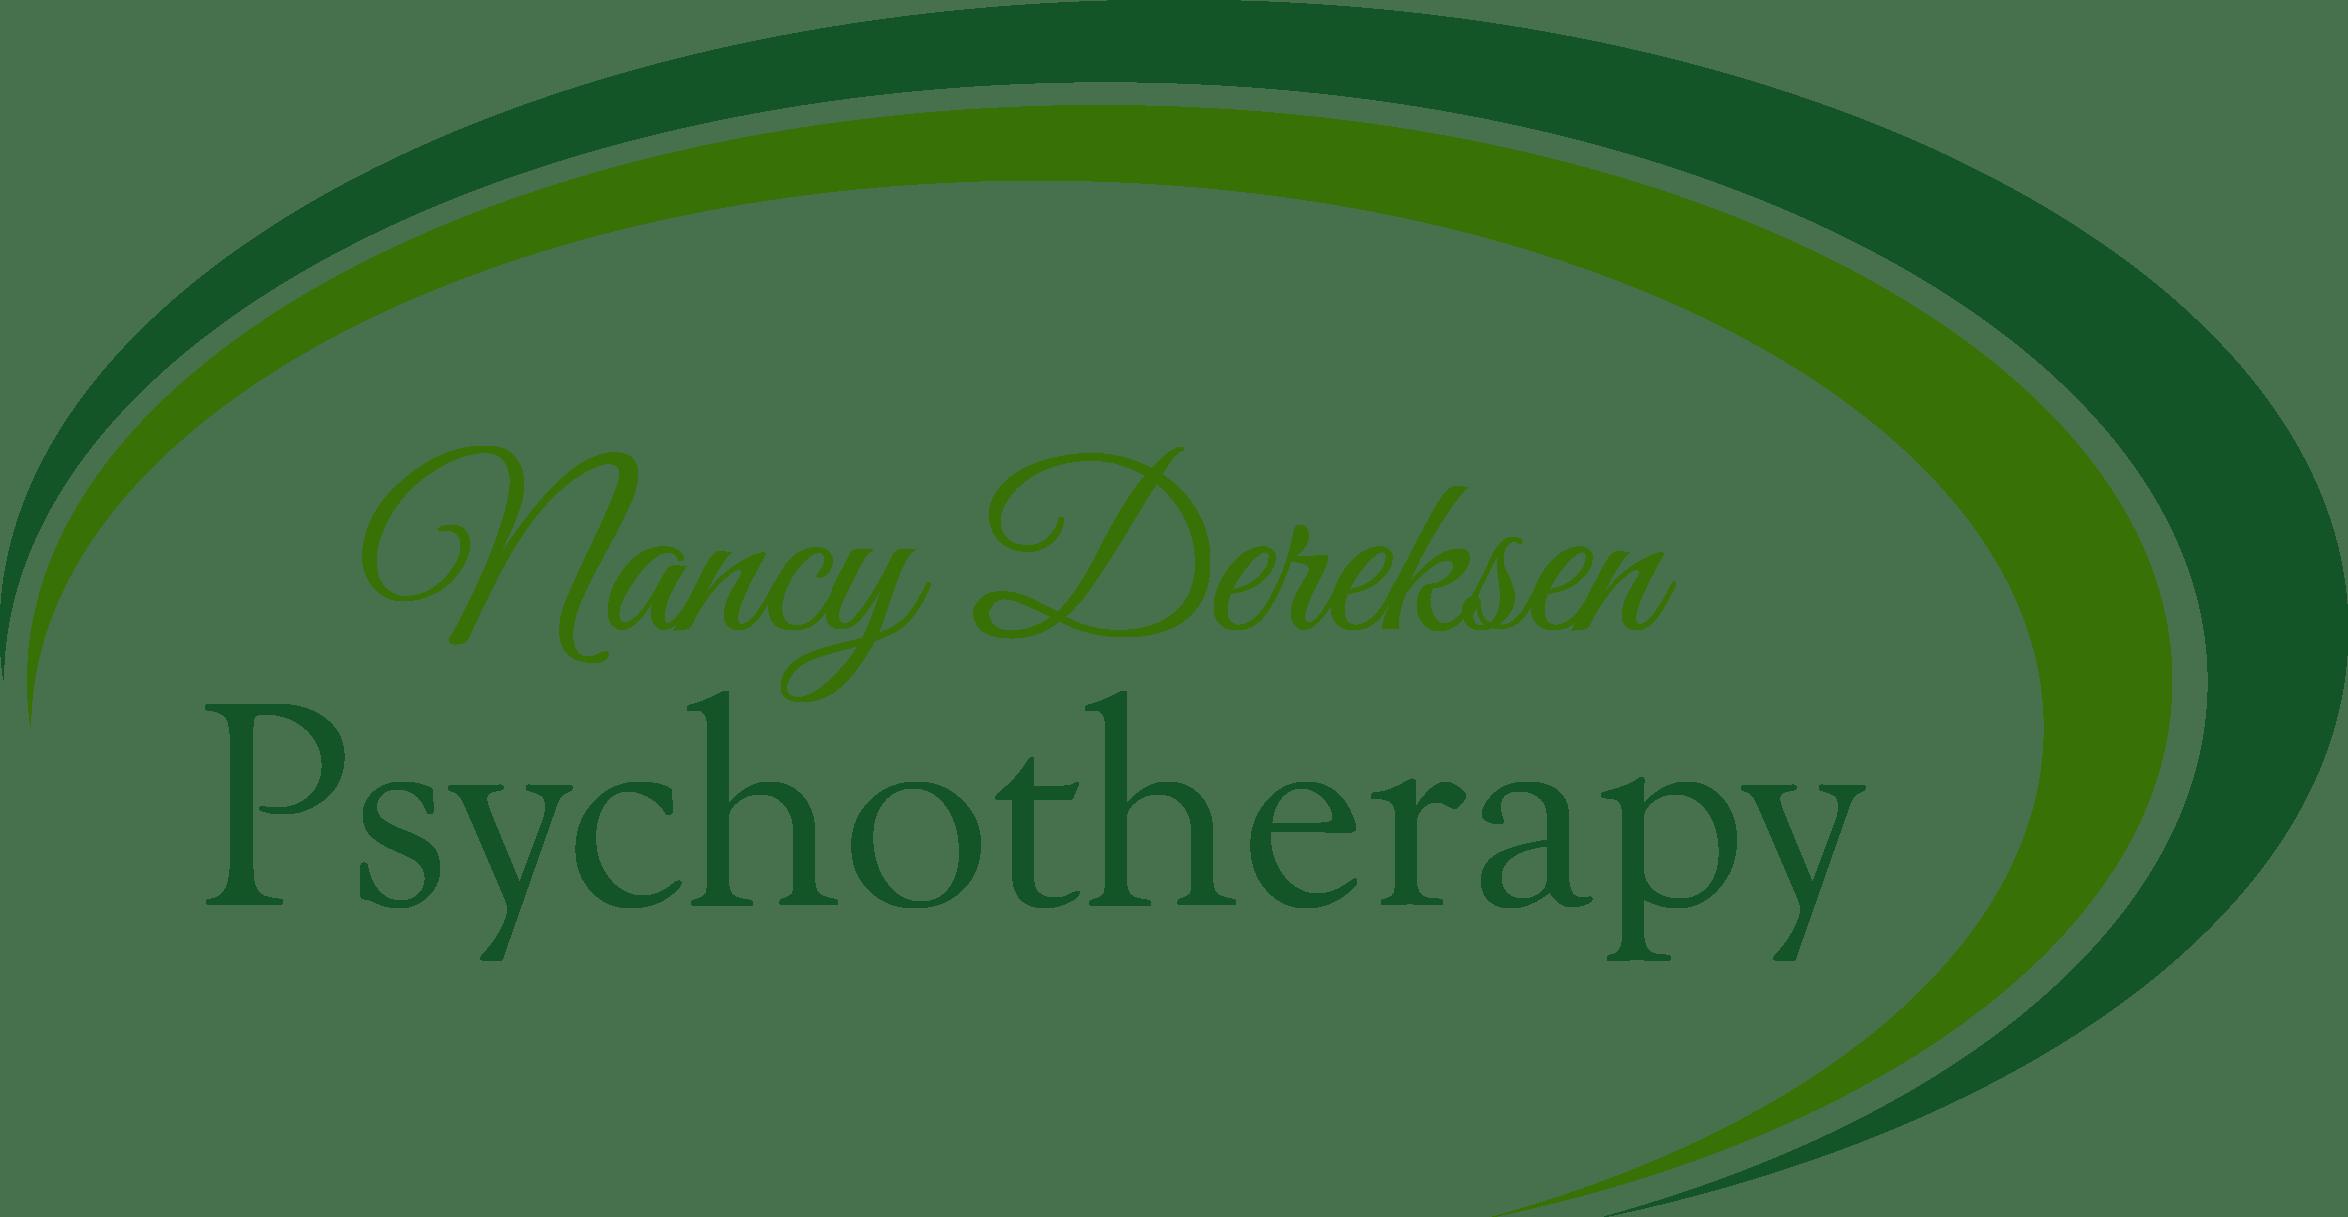 https://i2.wp.com/www.sumydesigns.com/wp-content/uploads/2016/06/Nancy_Dereksen_Logo.png?ssl=1